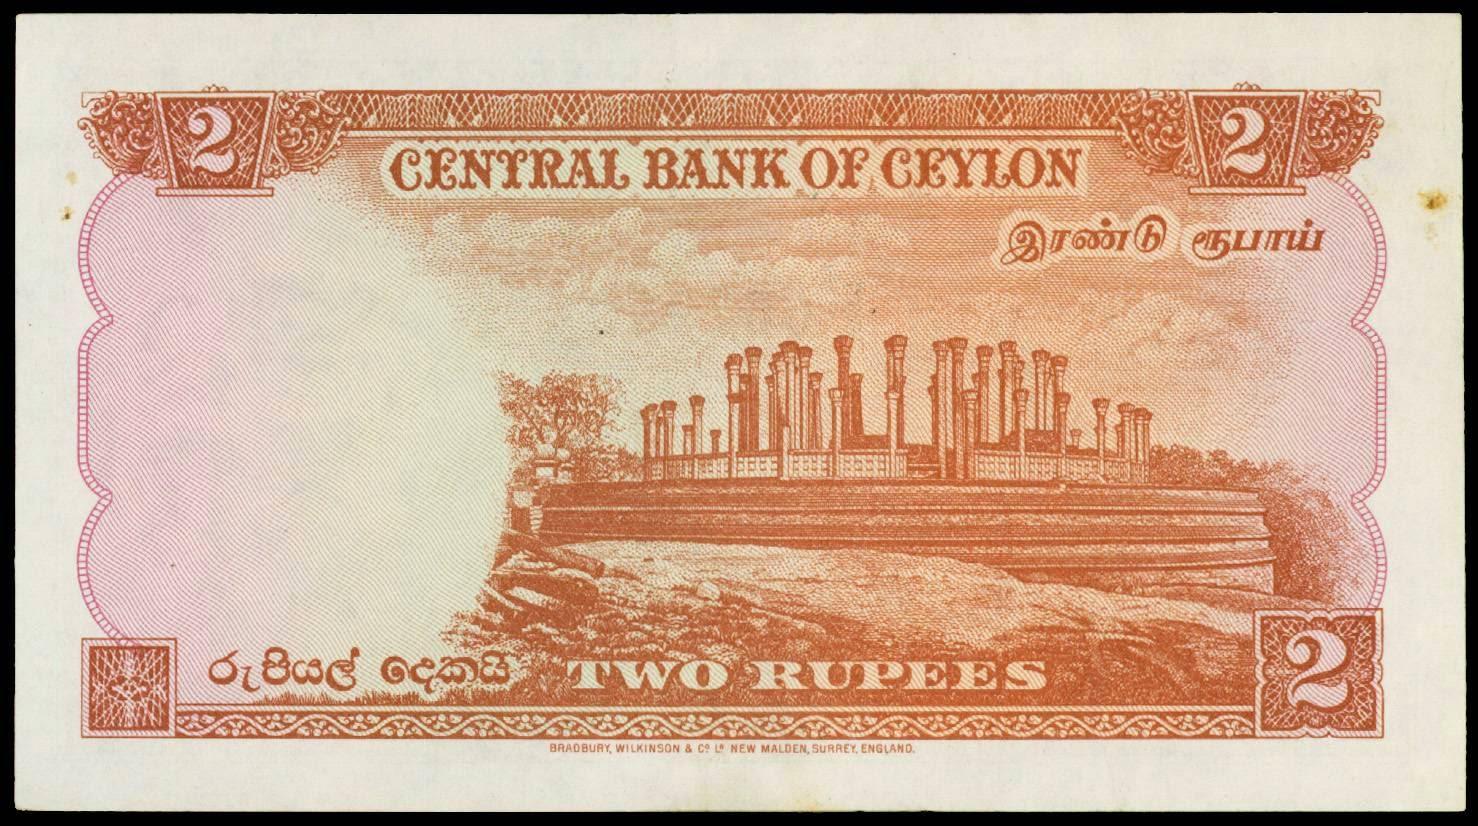 Ceylon currency notes 2 Rupees 1952 Medirigiriya Vatadage Polonnaruwa Sri Lanka